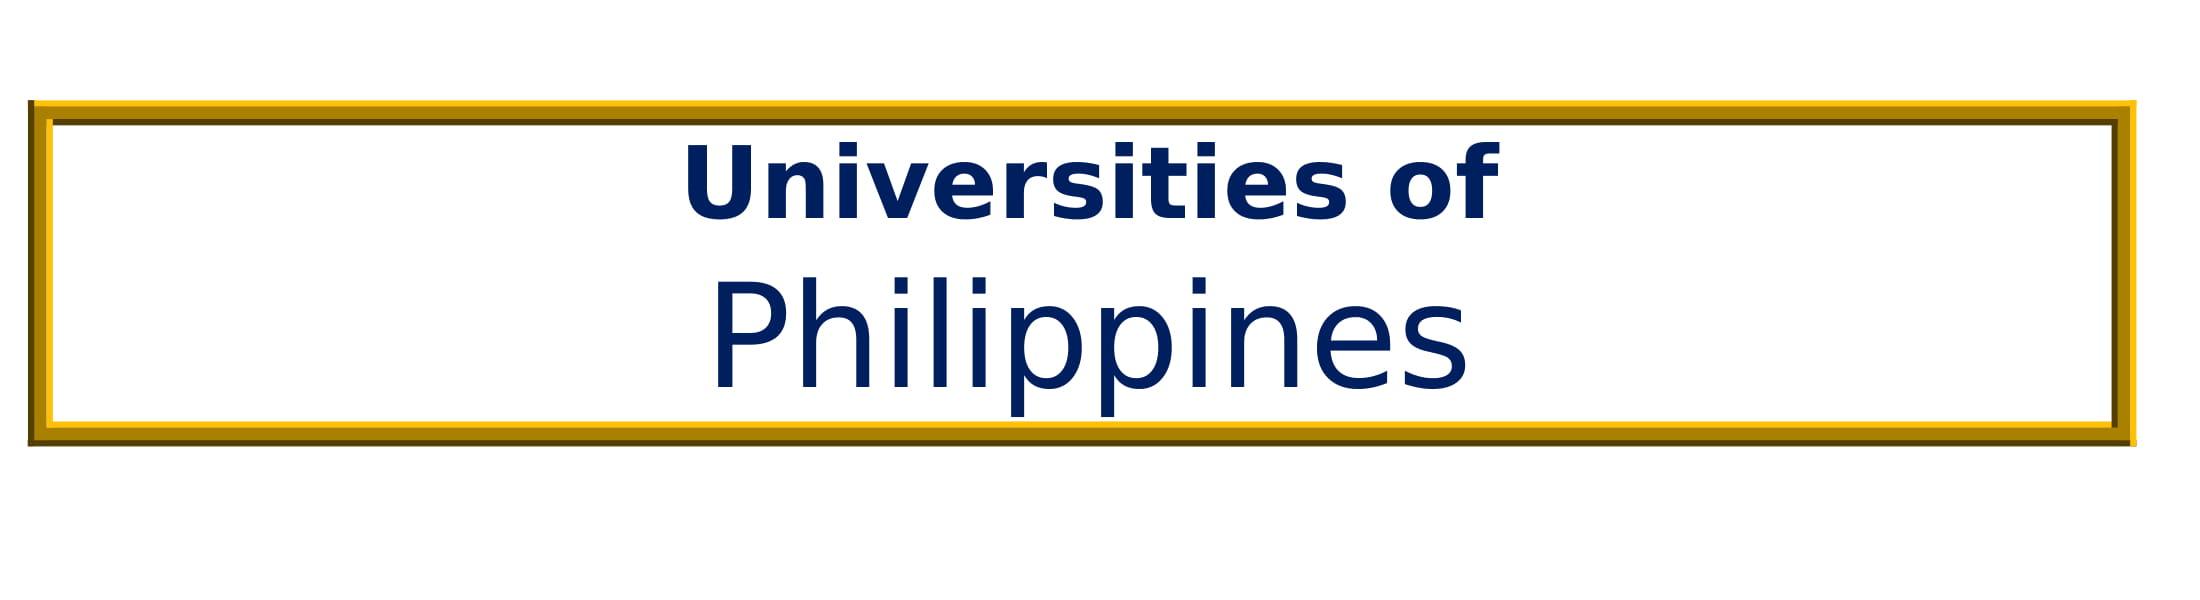 List of Universities in Philippines